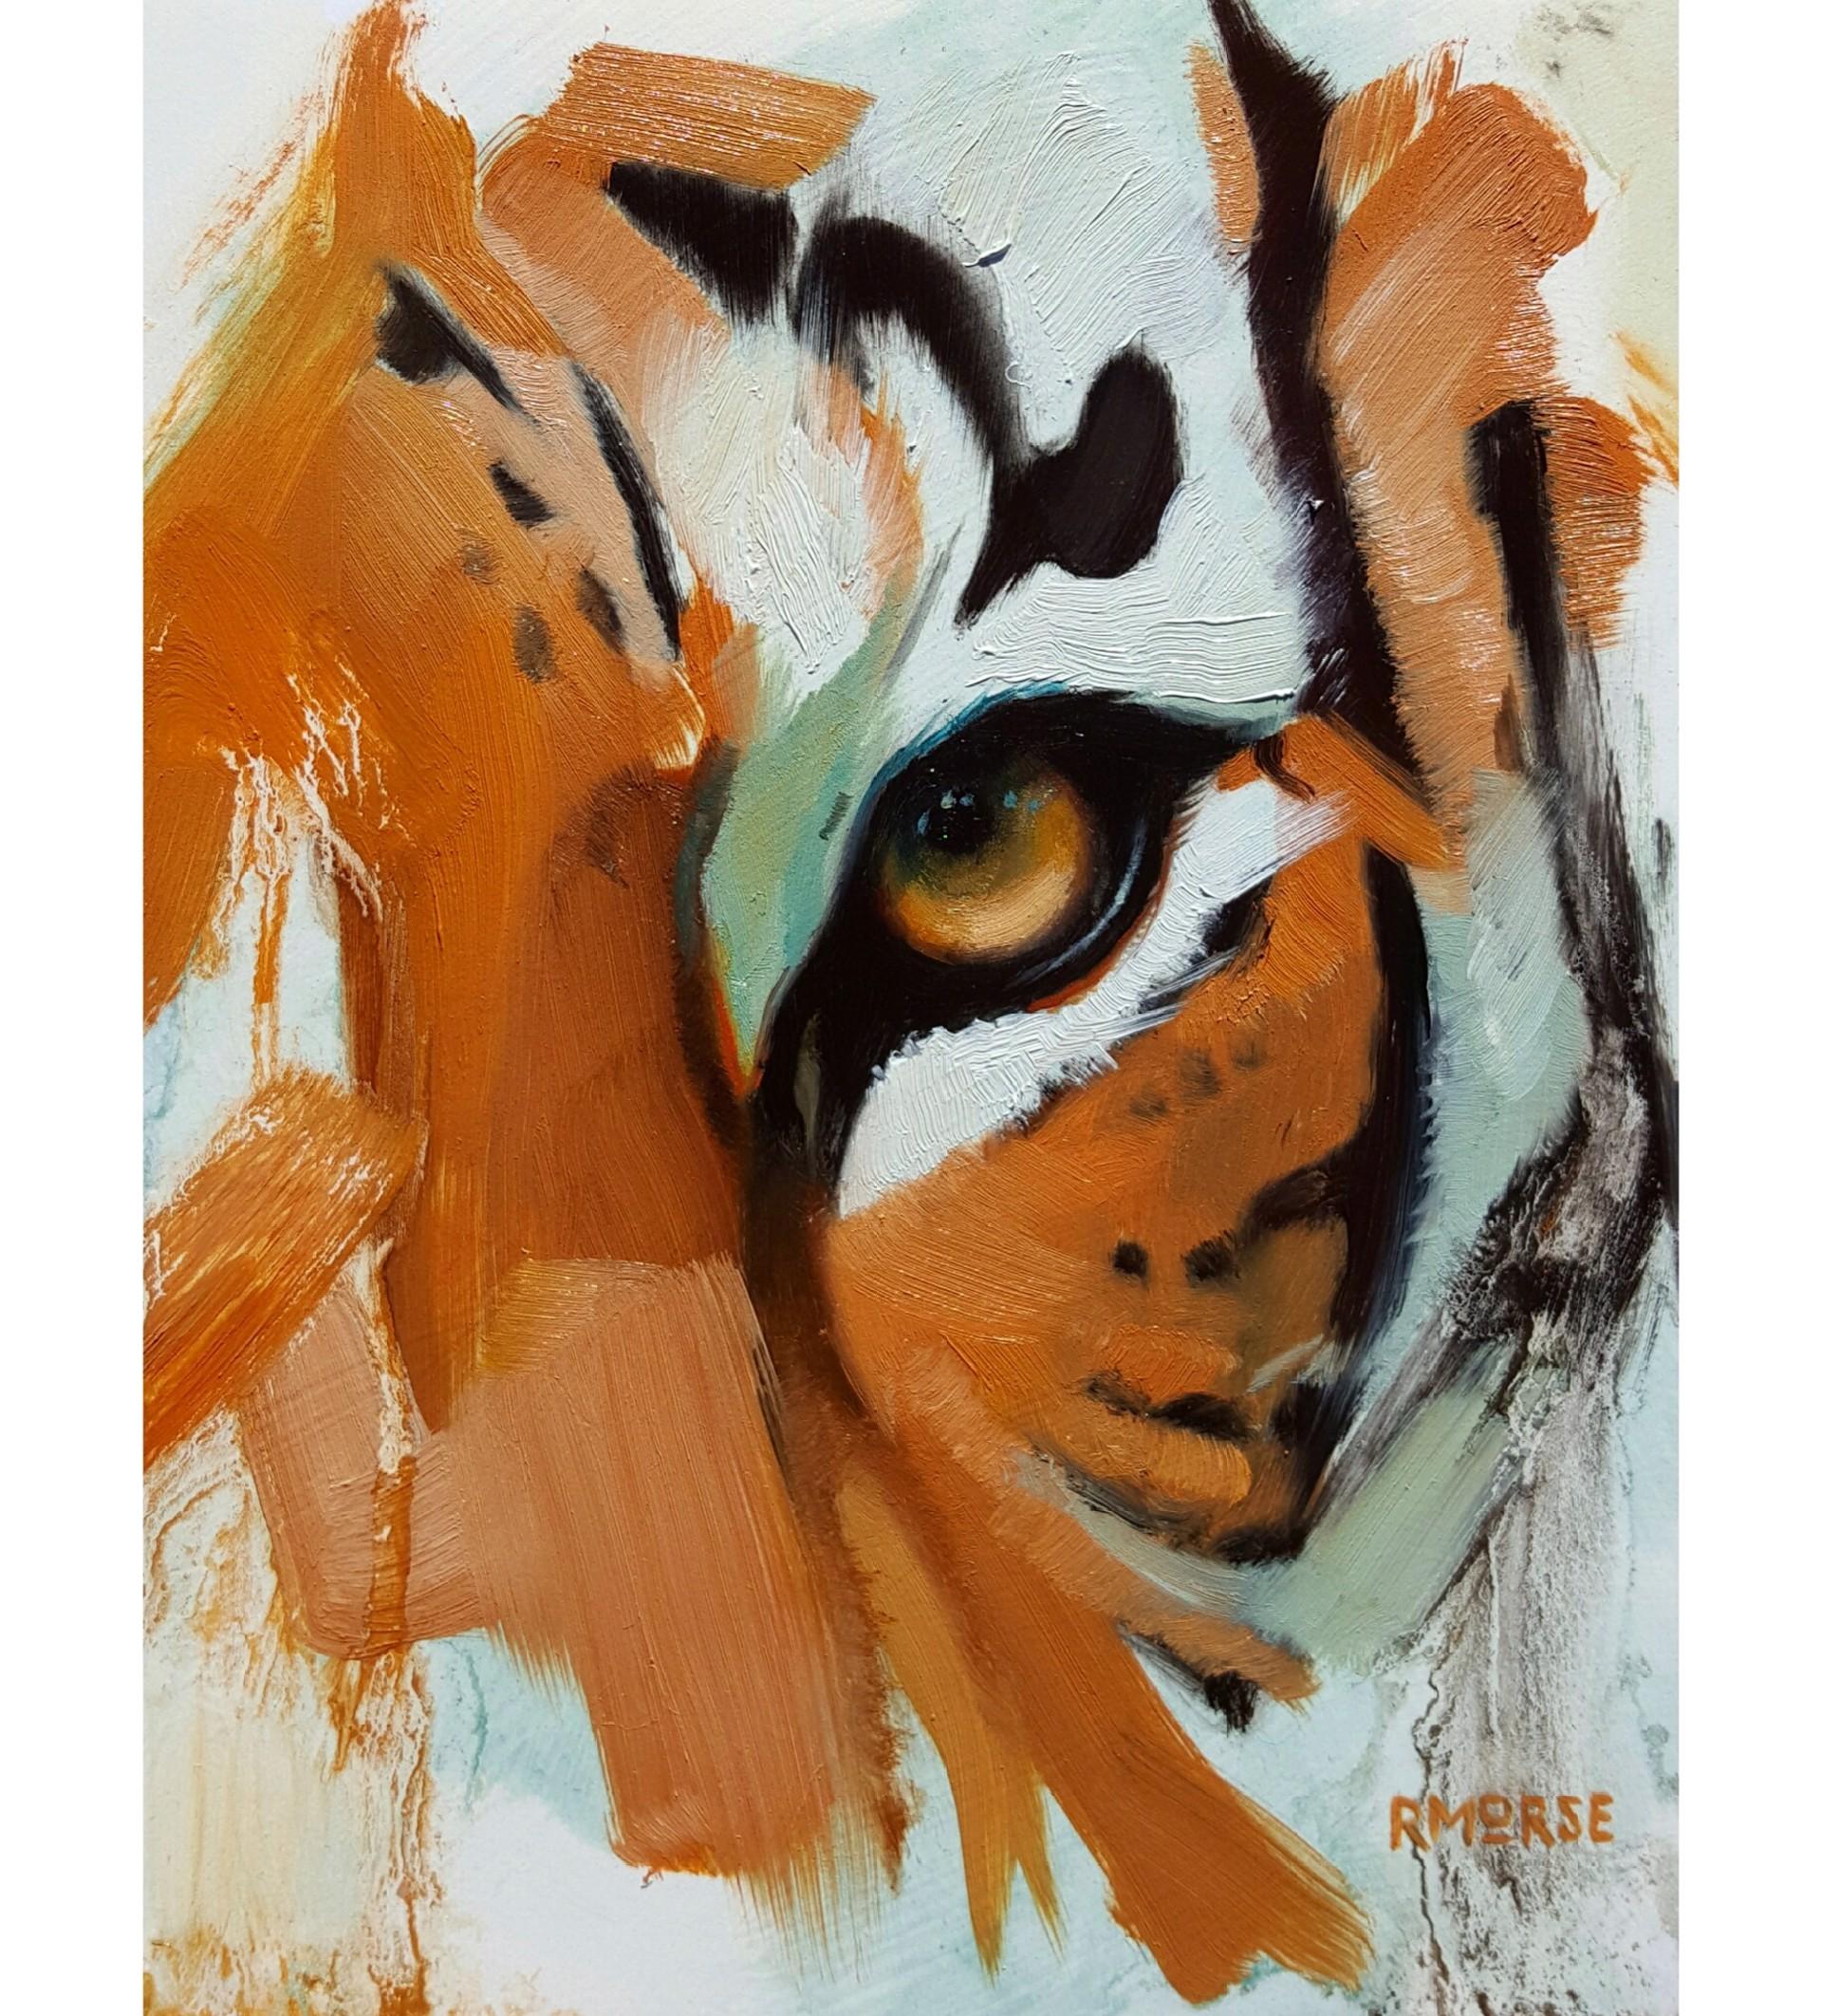 Eye of the Tiger by Ryan Morse